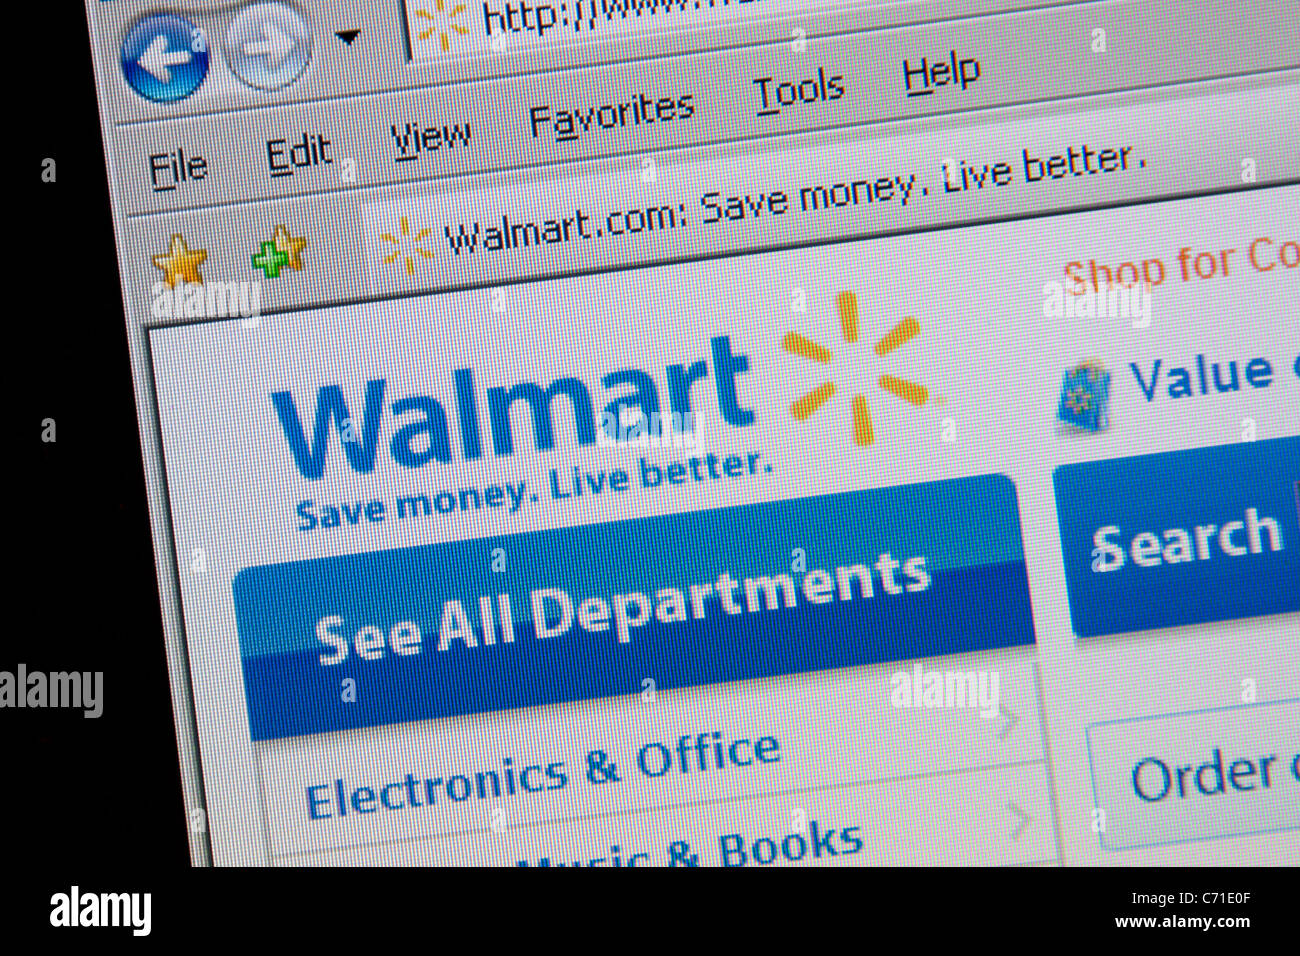 Our Walmart Stock Photos & Our Walmart Stock Images - Alamy